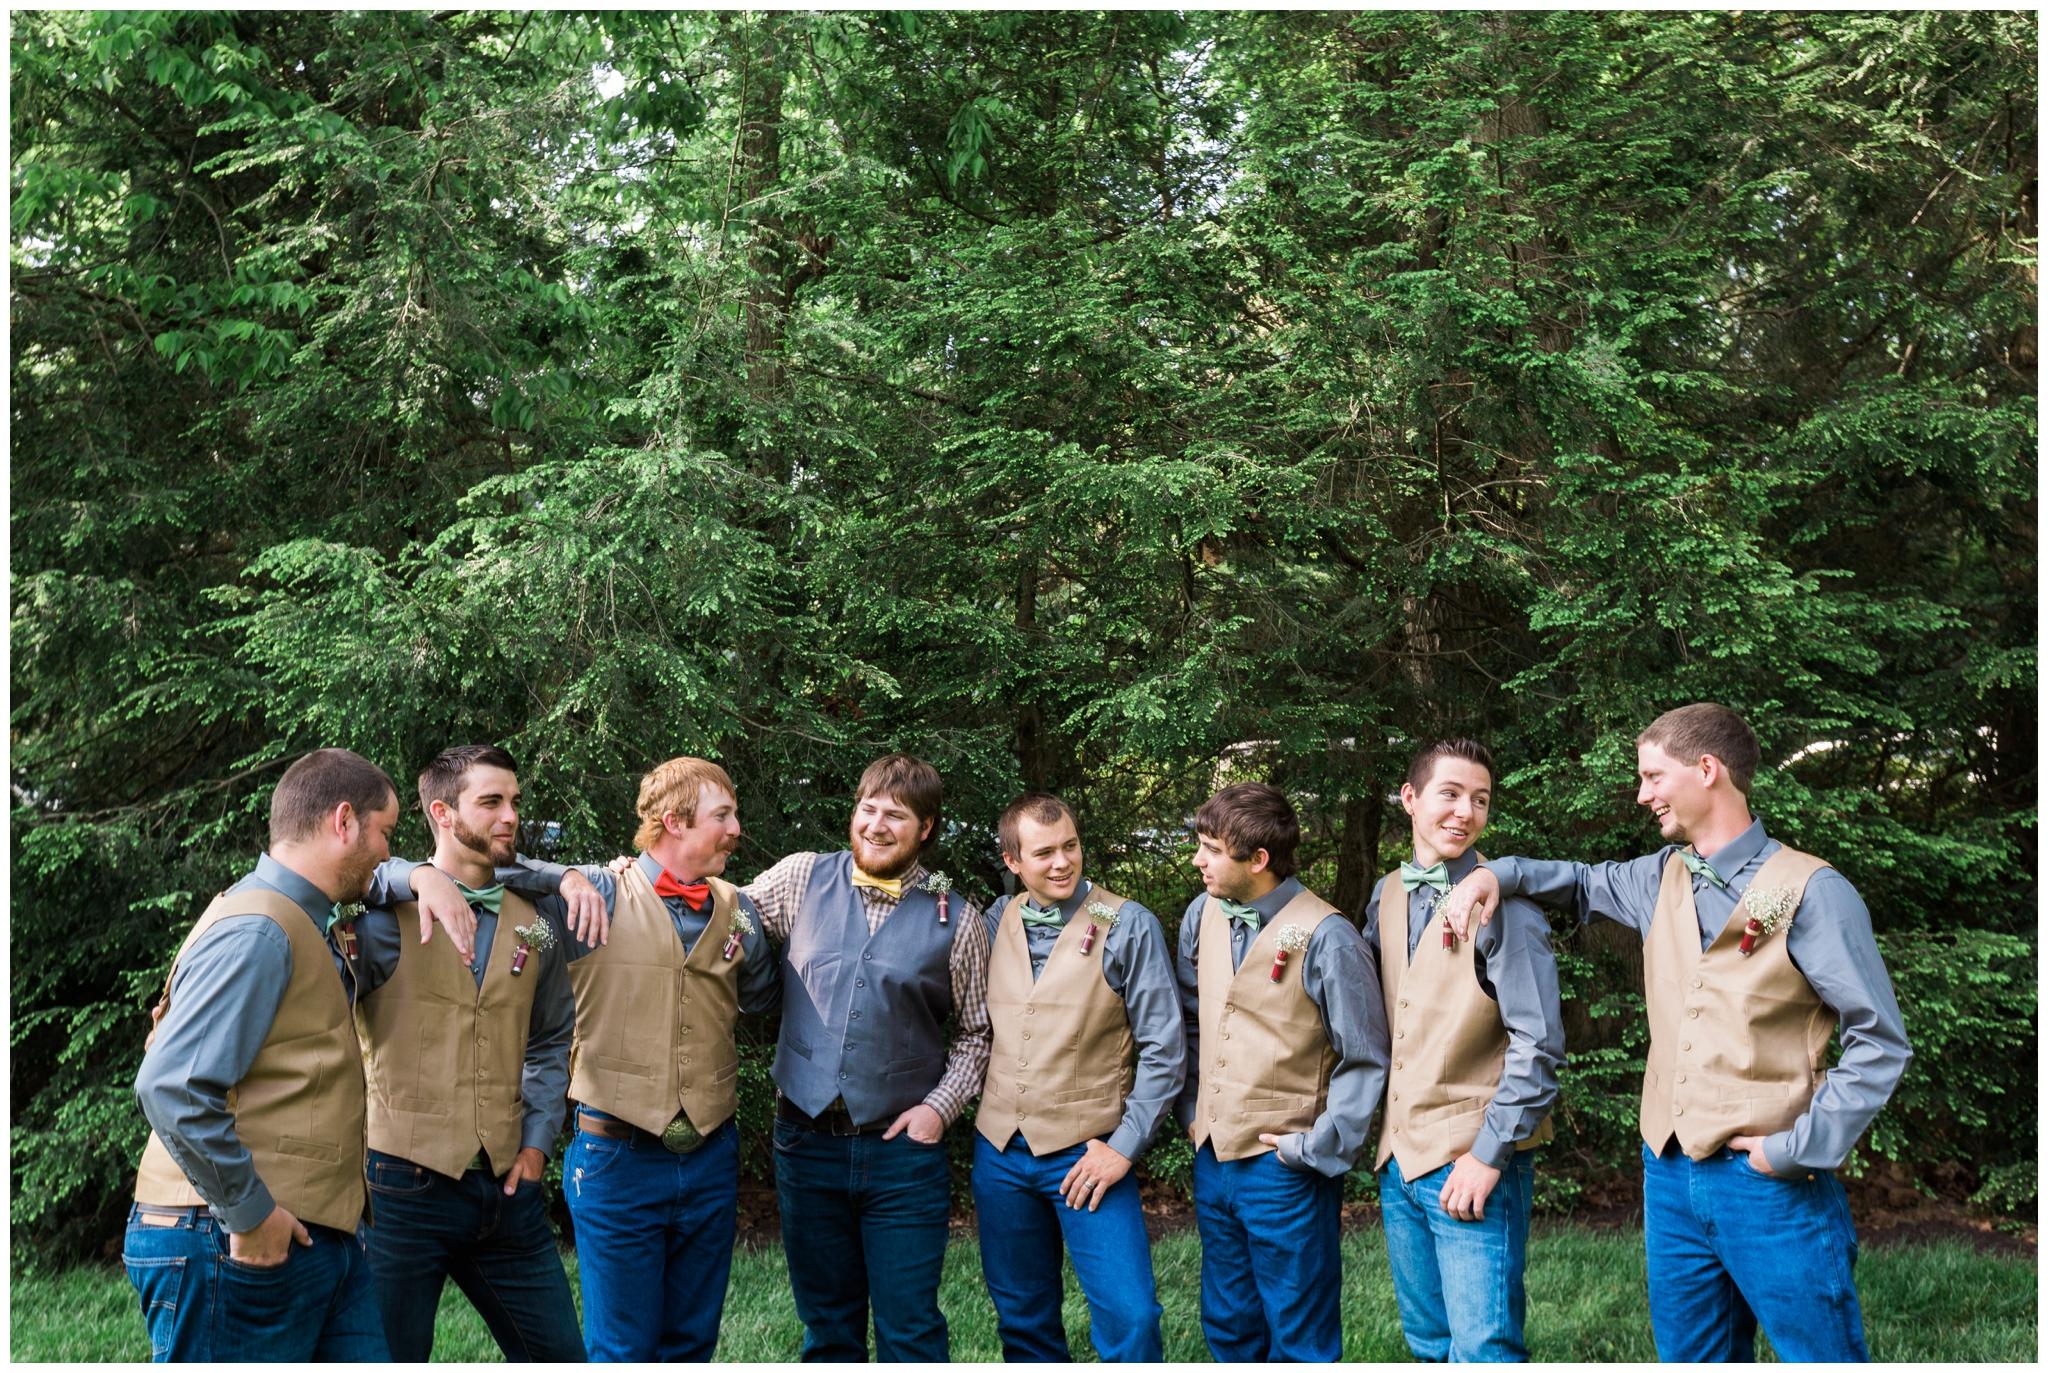 emily-grace-photography-elizabethtown-pa-rustic-chic-wedding